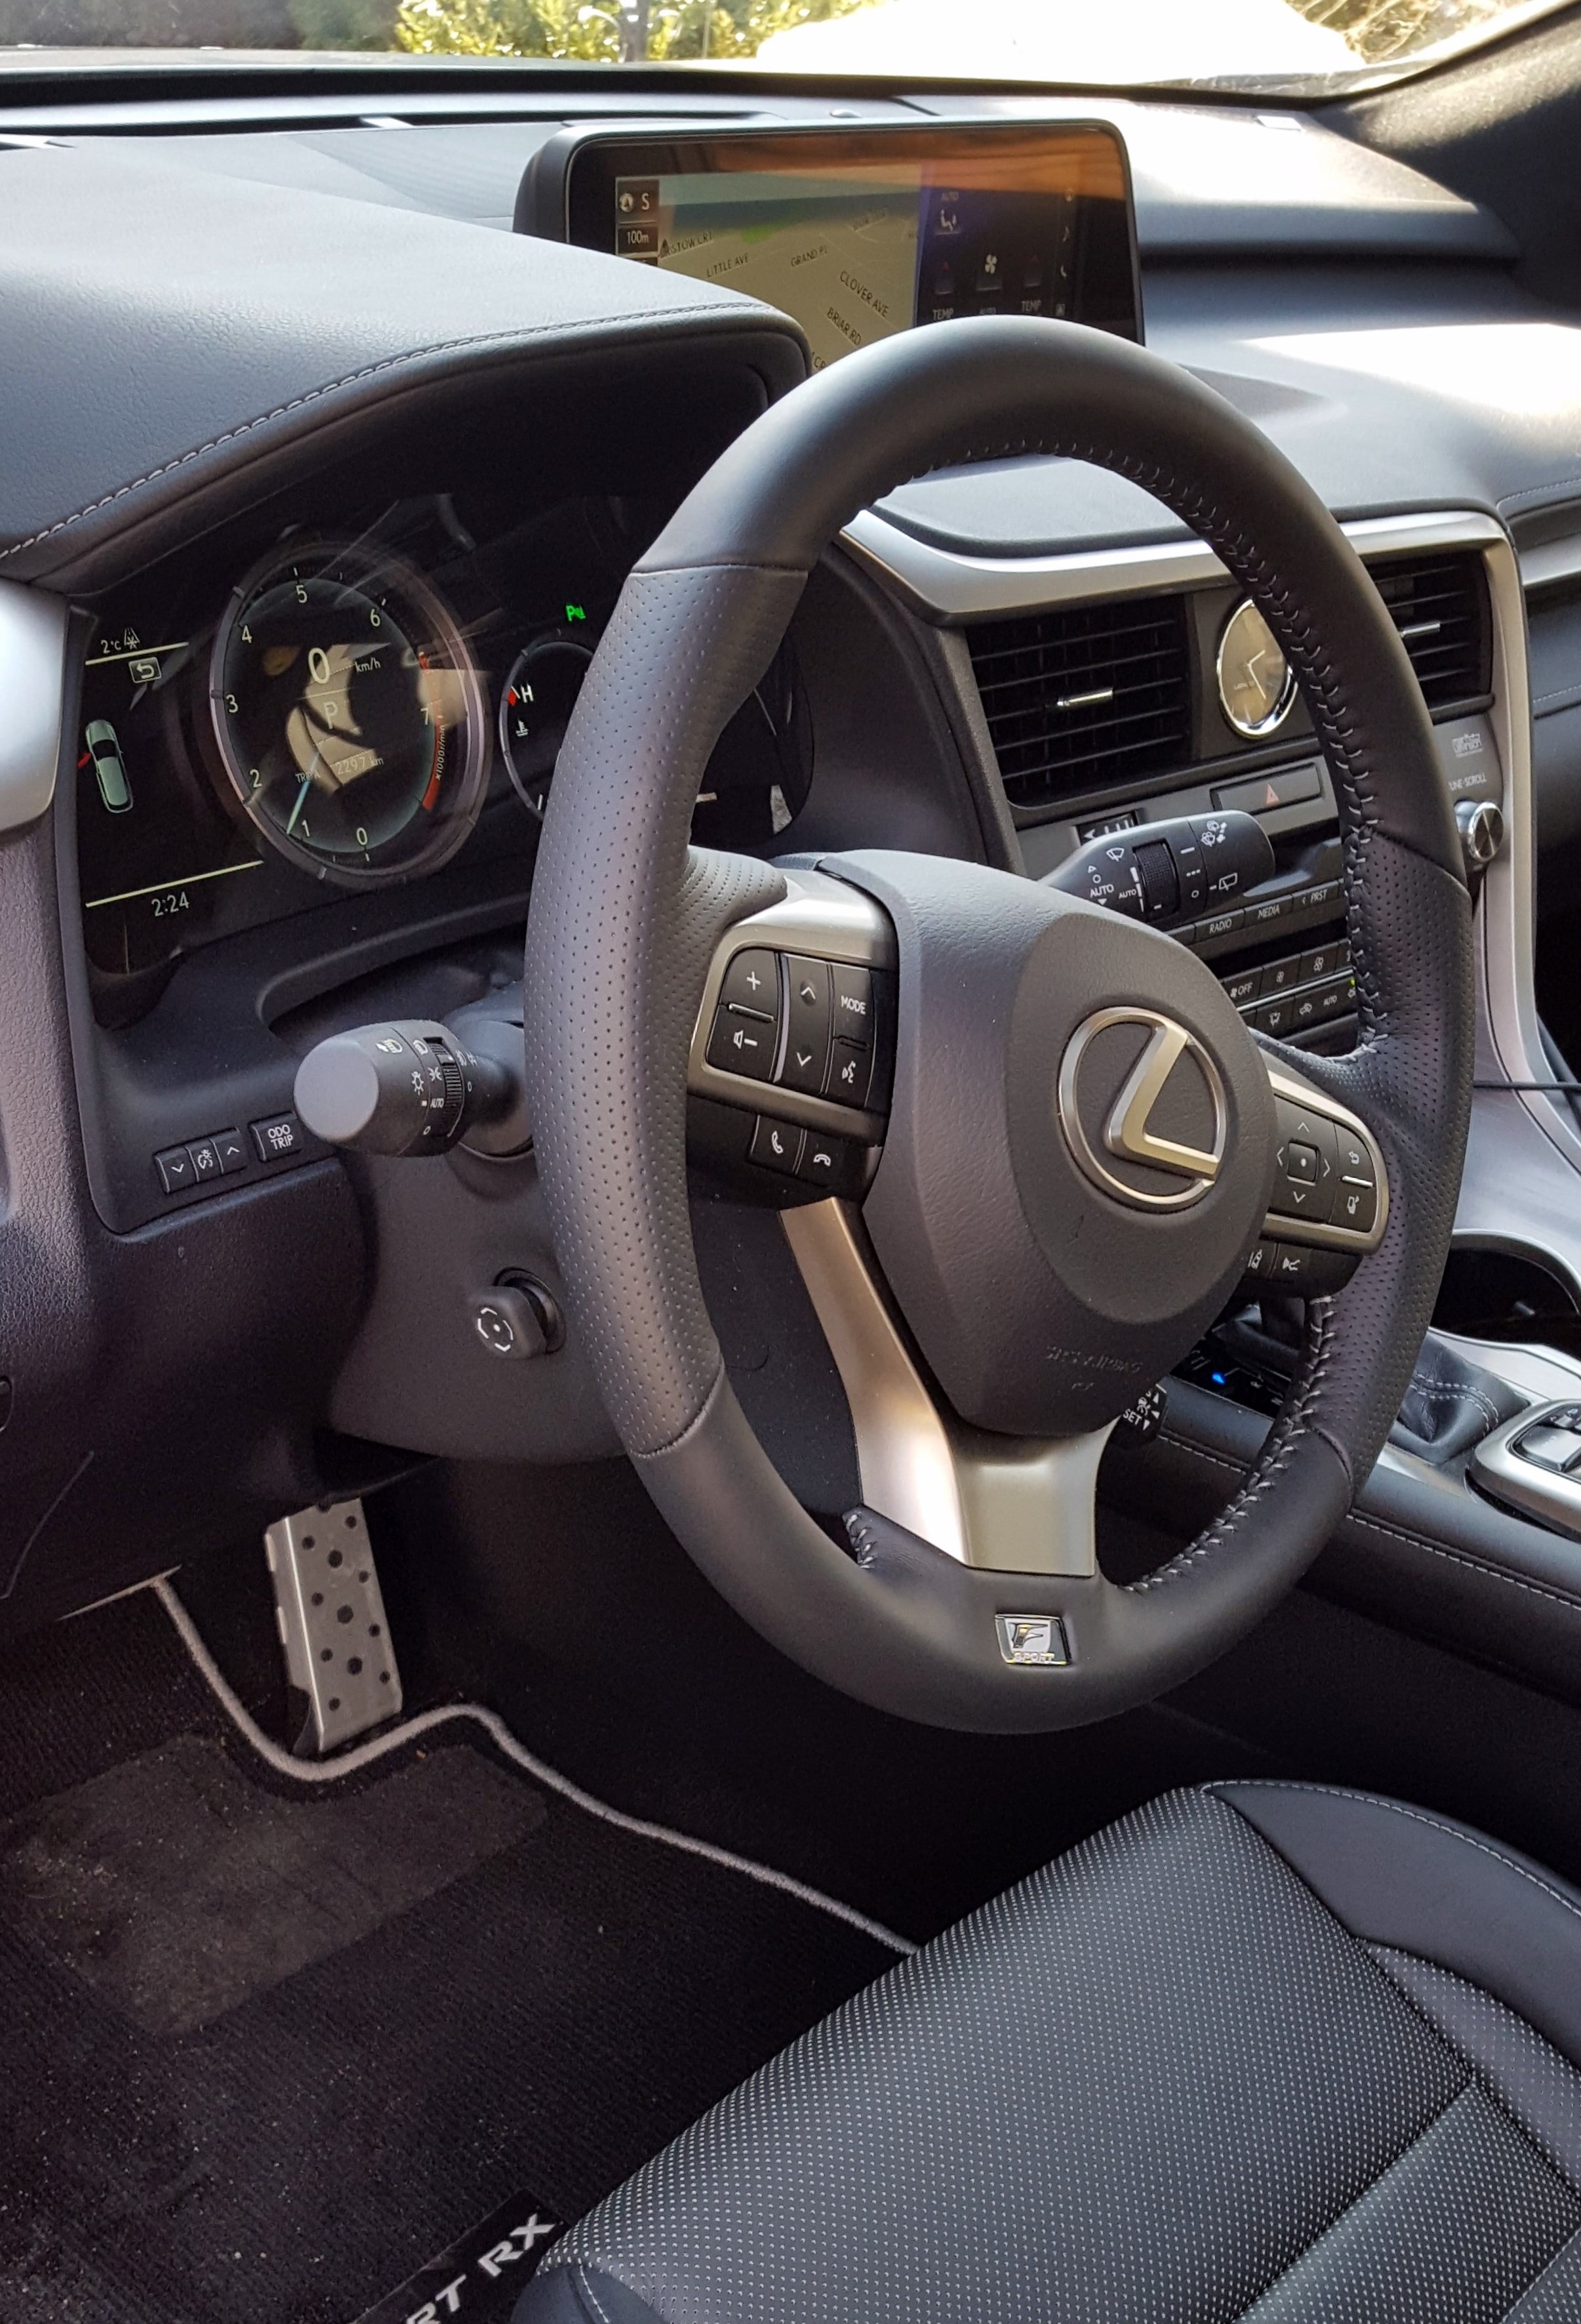 Lexus RX 350 Canada s Best selling Luxury SUV lexus